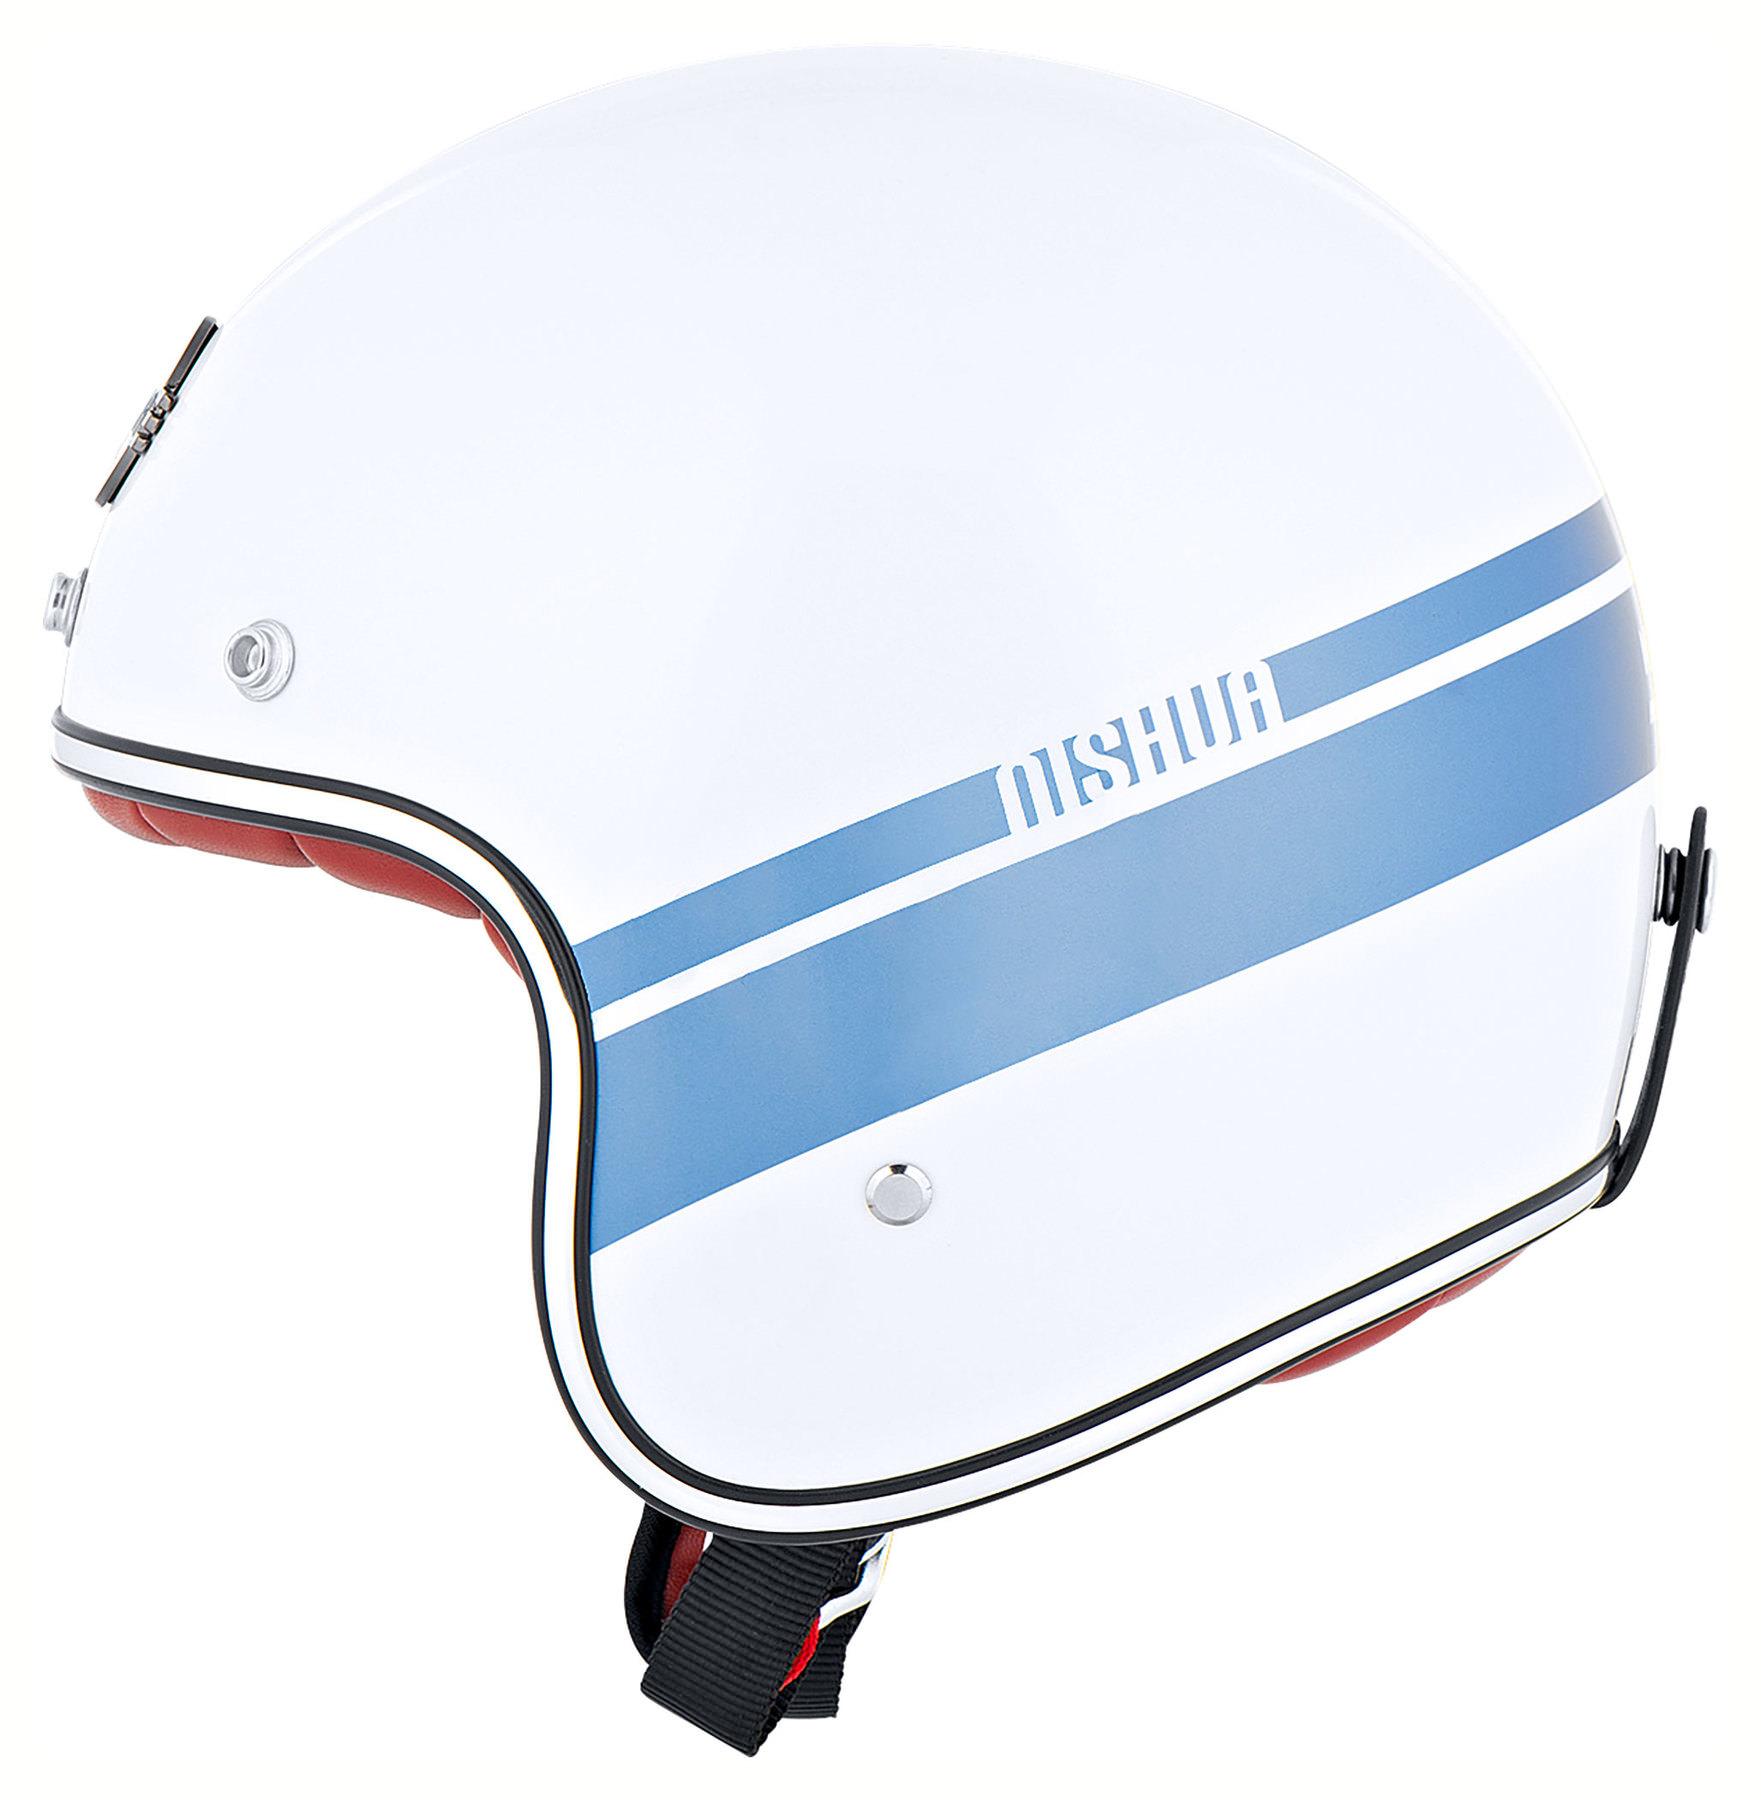 Nishua Jet 2